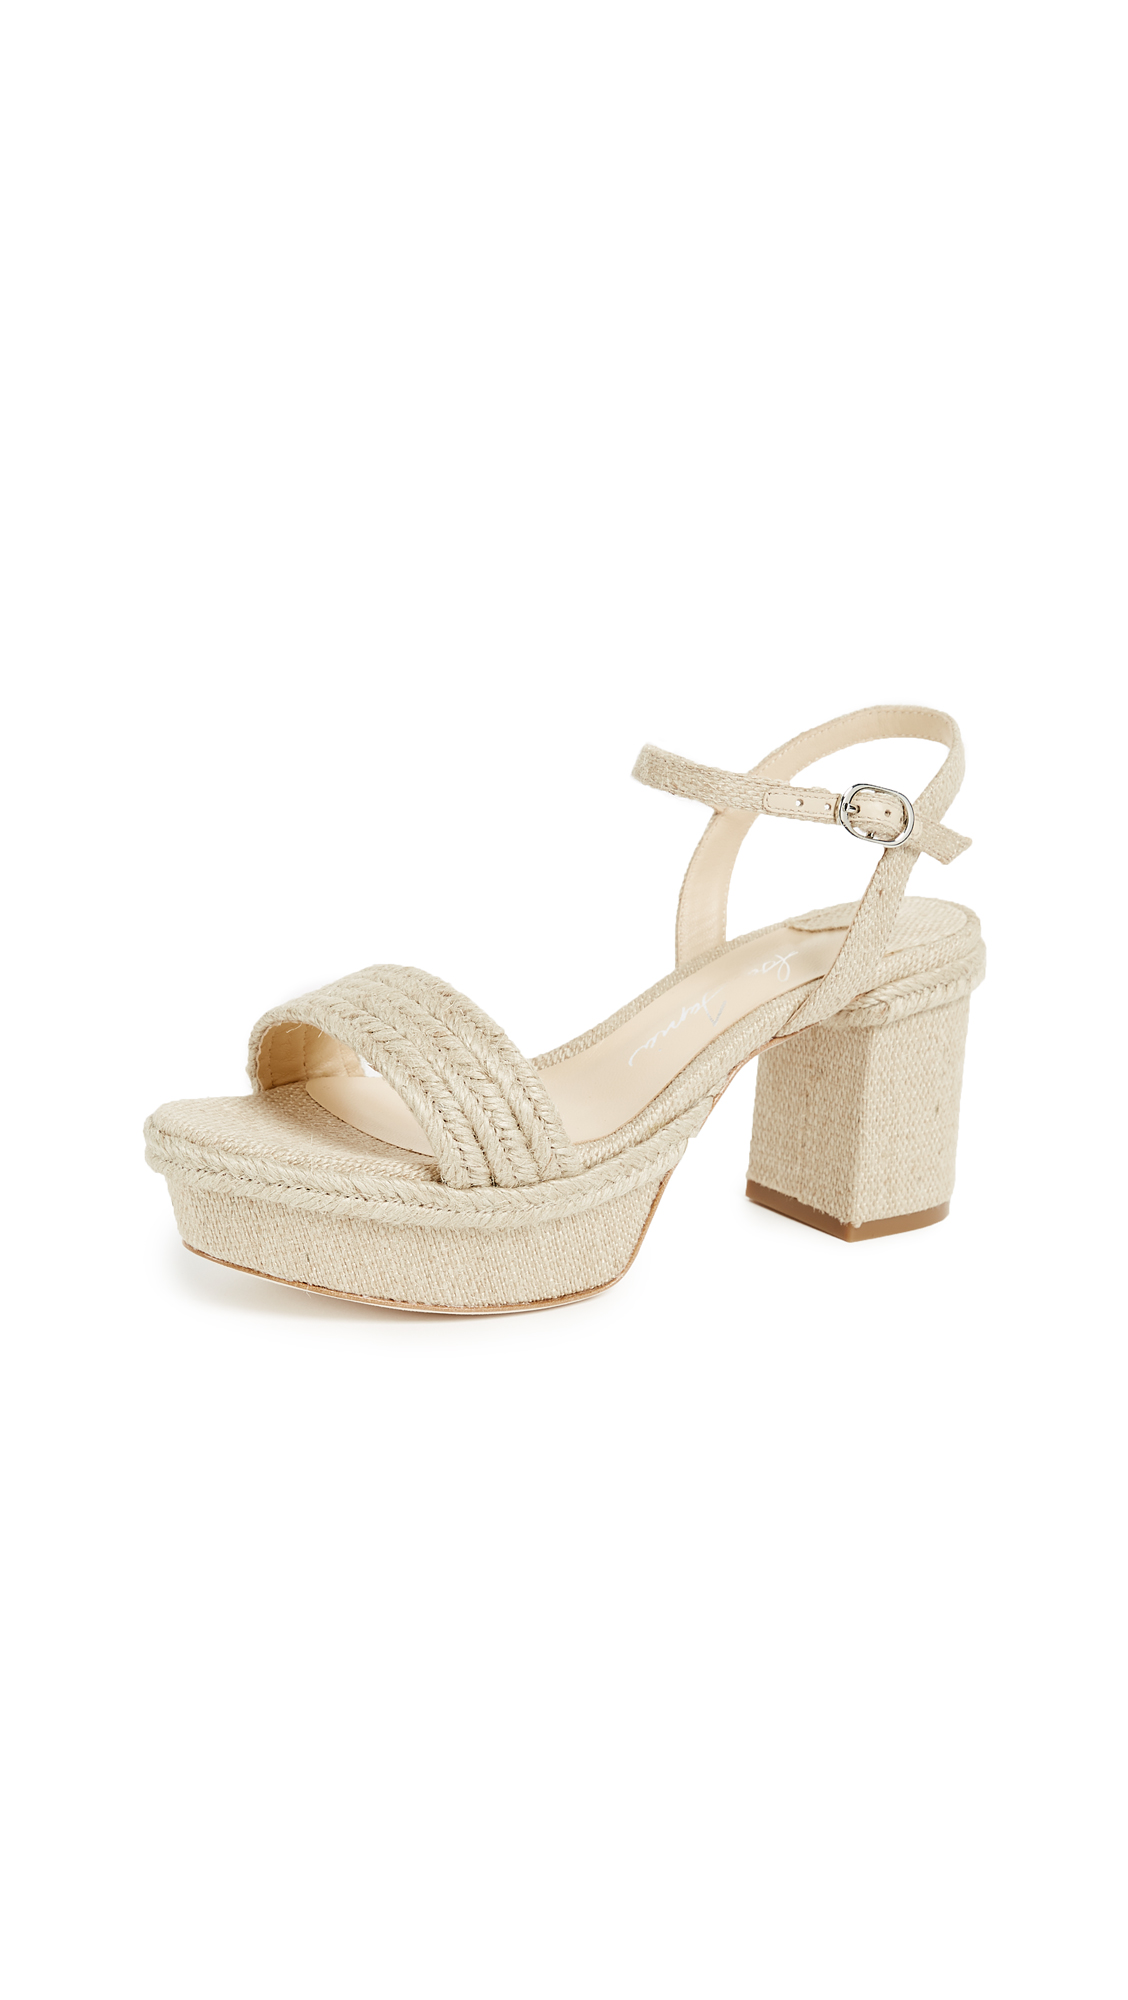 Isa Tapia Playa Platform Sandals - Natural